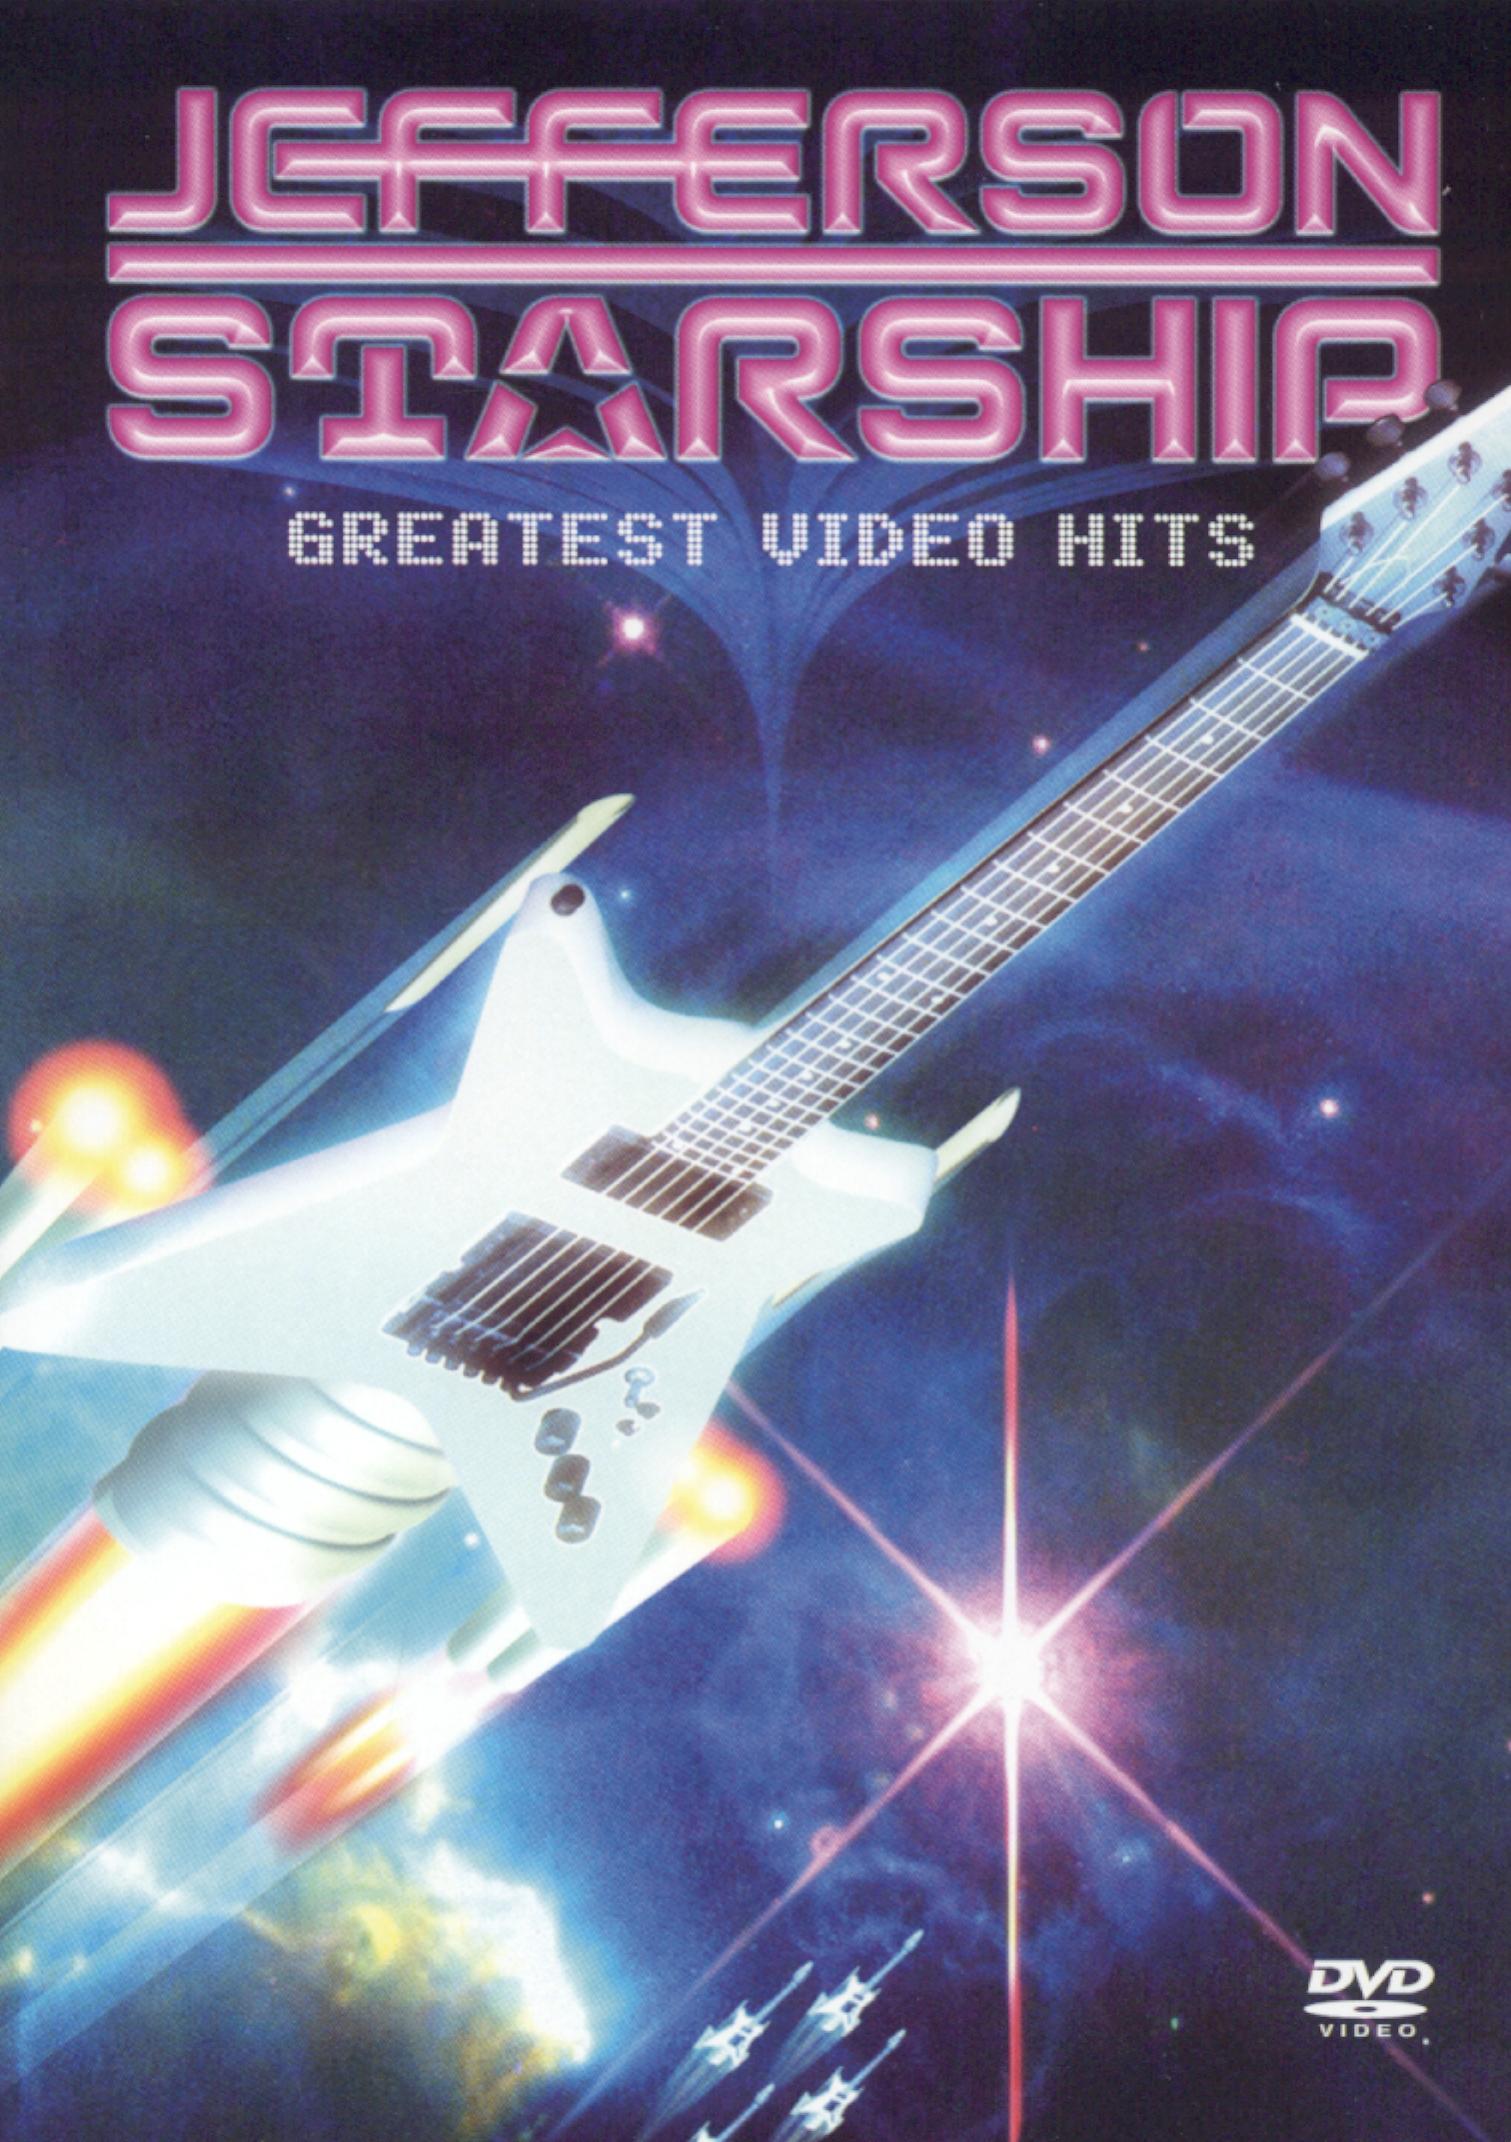 Jefferson Starship: Greatest Video Hits